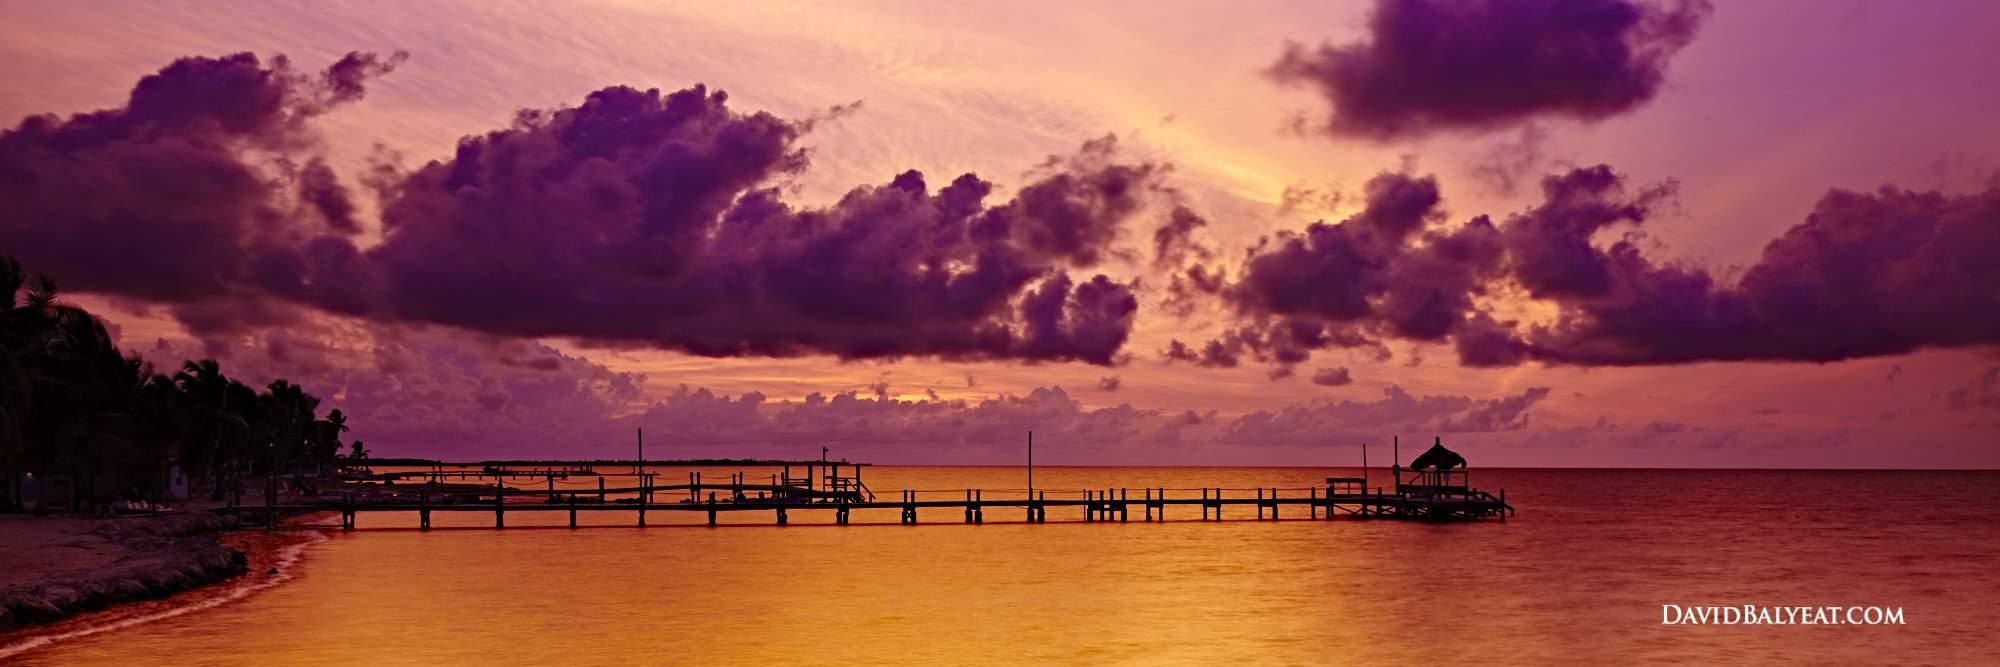 Florida Keys sunrise jetty panoramic high definition HD photography